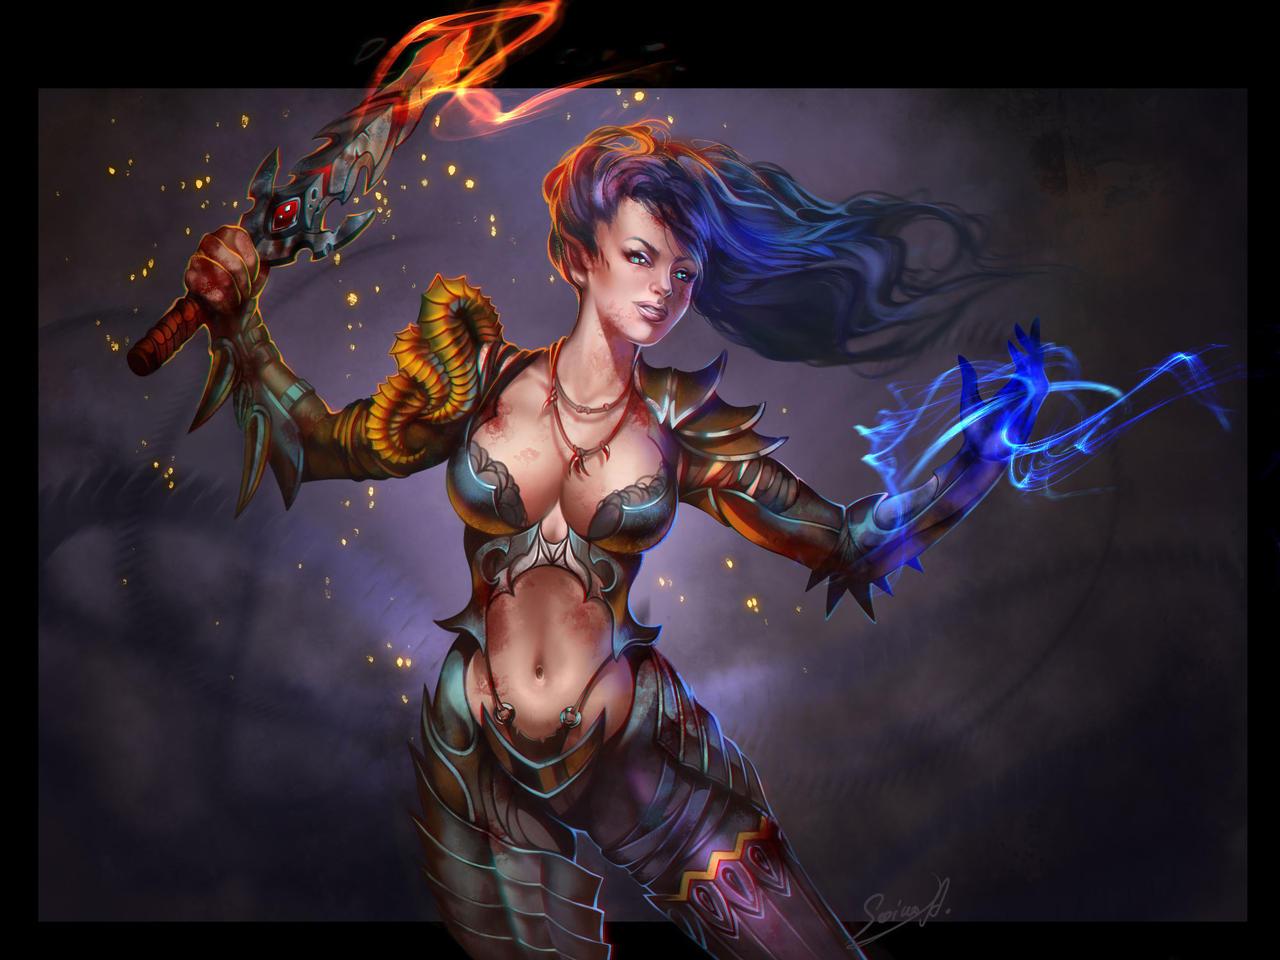 Dragon woman by Sinto-risky